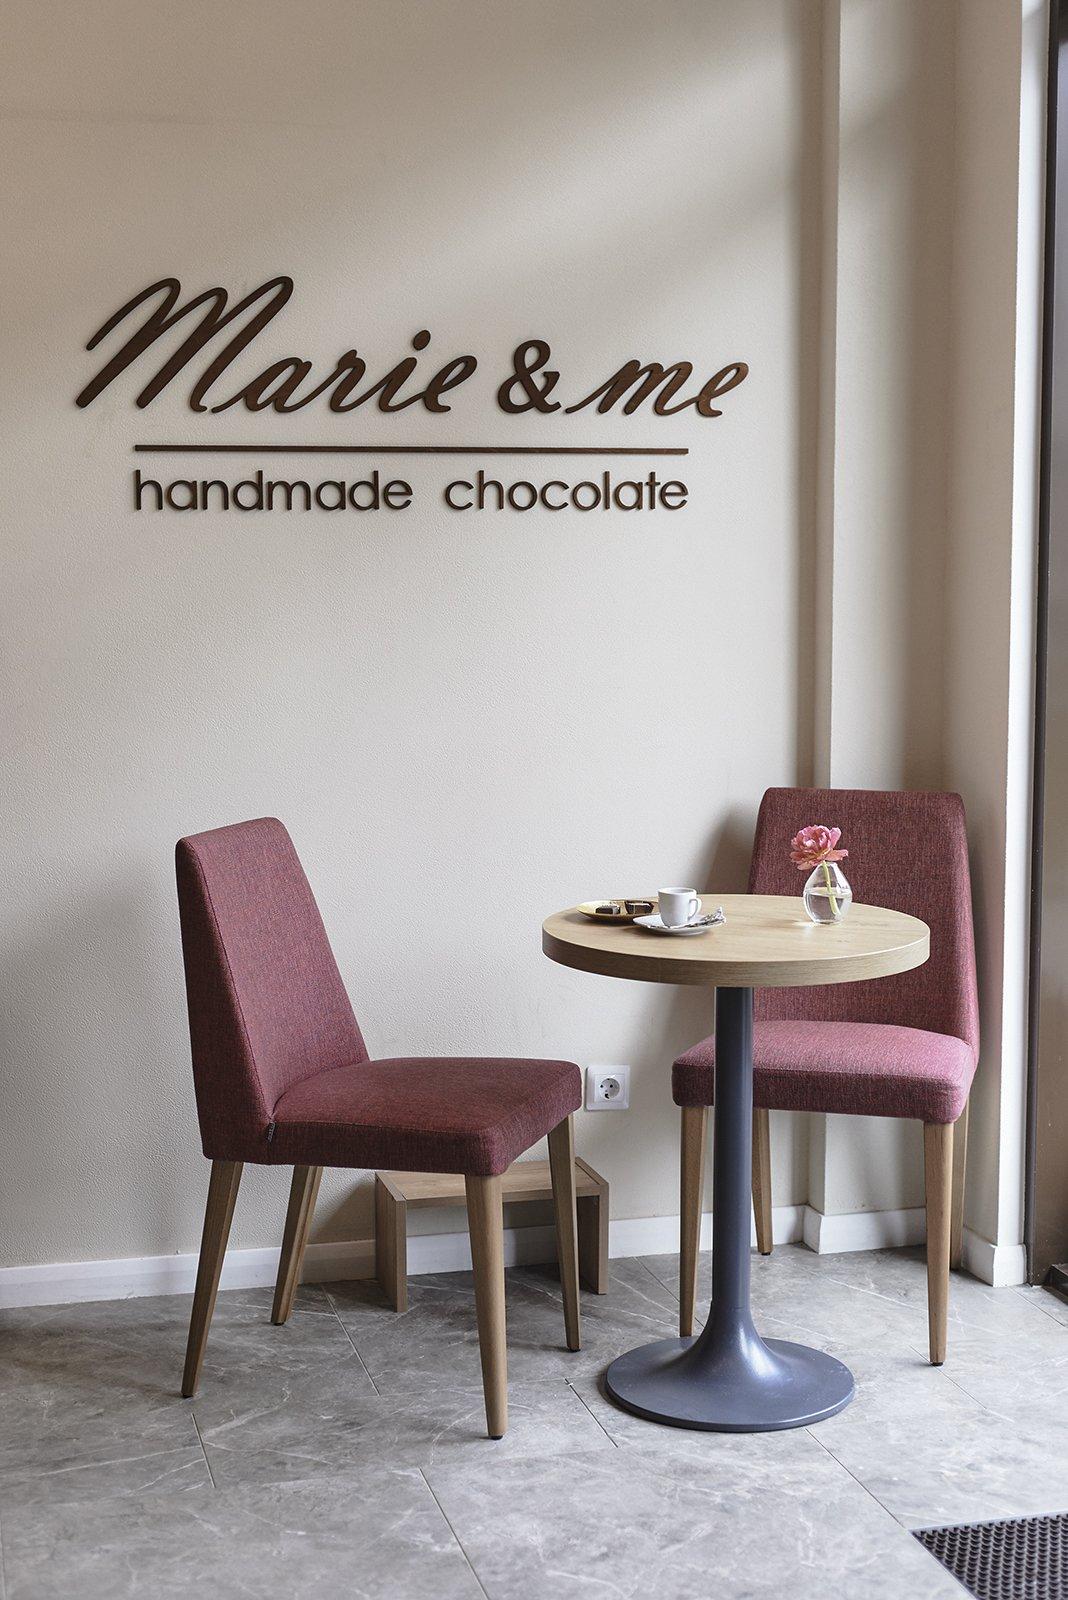 Ателье шоколада Marie & me